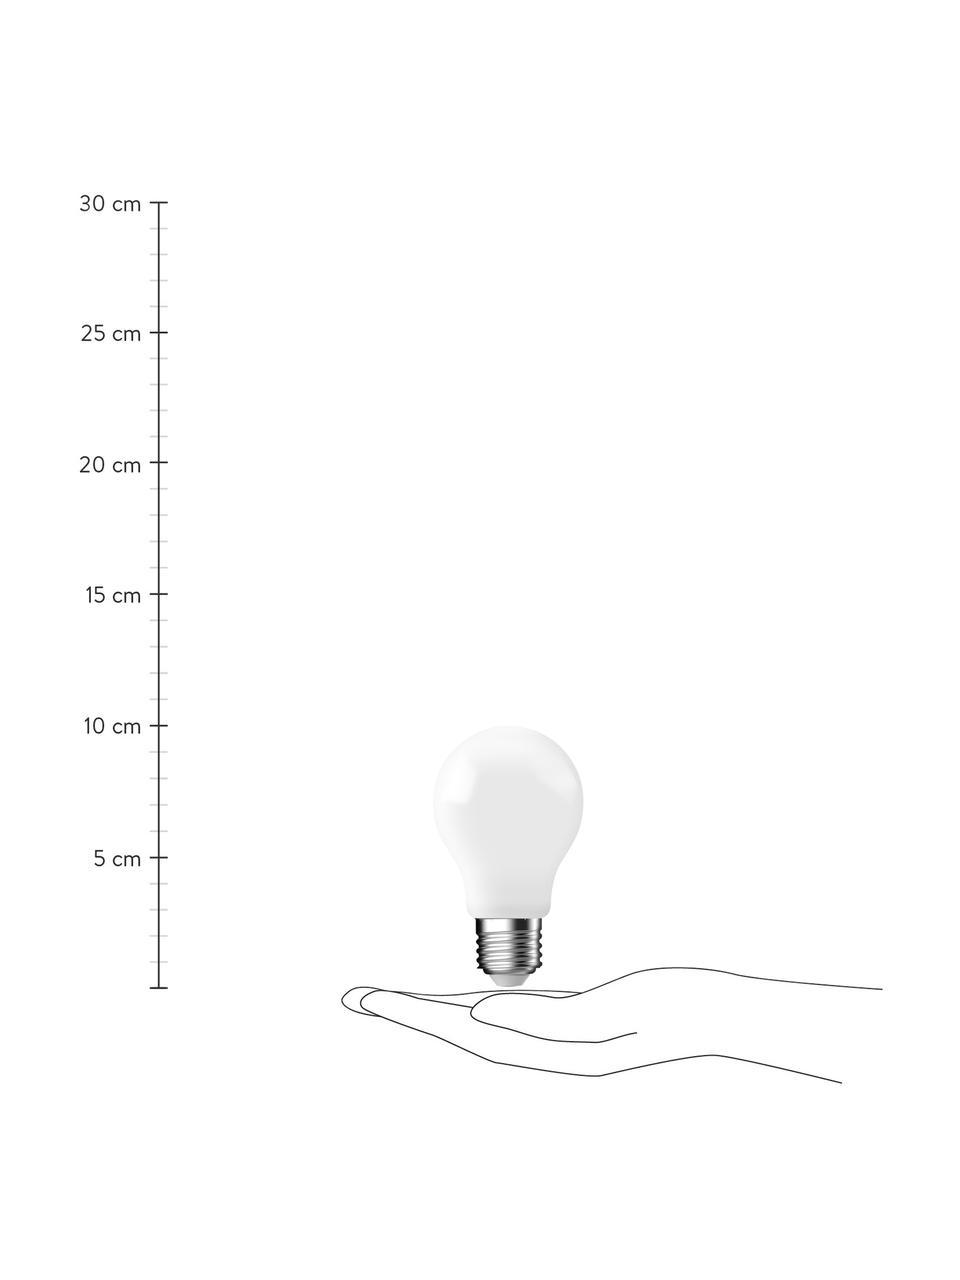 E27 Leuchtmittel, 8.6W, dimmbar, warmweiß, 7 Stück, Leuchtmittelschirm: Glas, Leuchtmittelfassung: Aluminium, Weiß, Ø 6 x H 10 cm